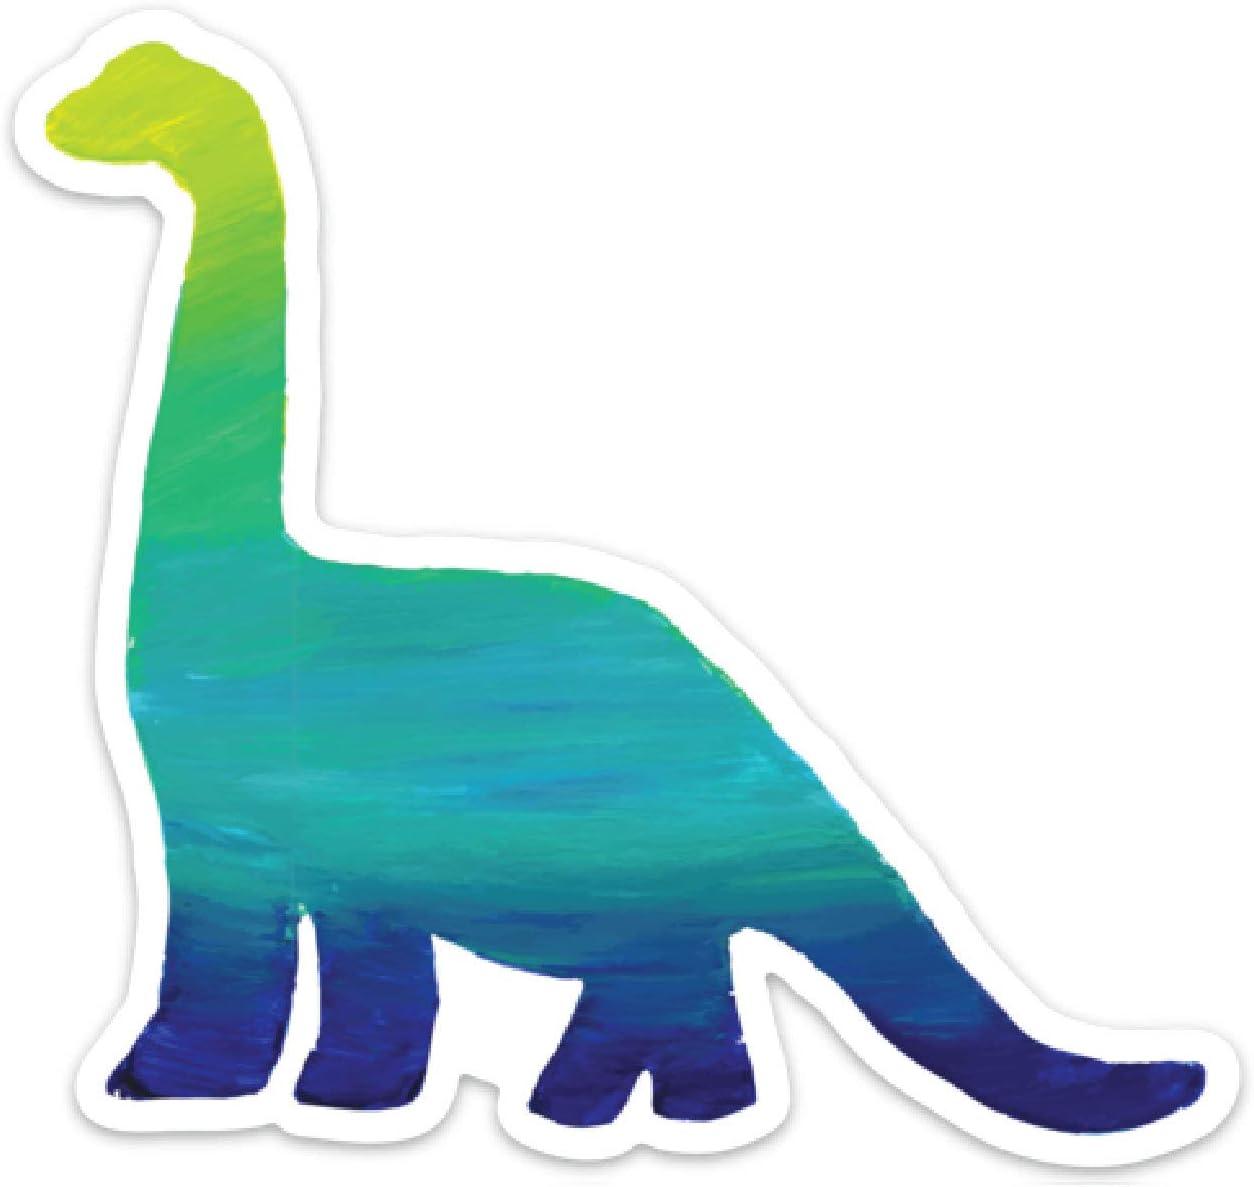 "Promini Dinosaur Sticker Dinosaur Decal Dinosaur Car Sticker Dinosaur Car Sticker Vinyl Sticker 4"" Laptop Sticker Luggage Sticker Phonecase Sticker"